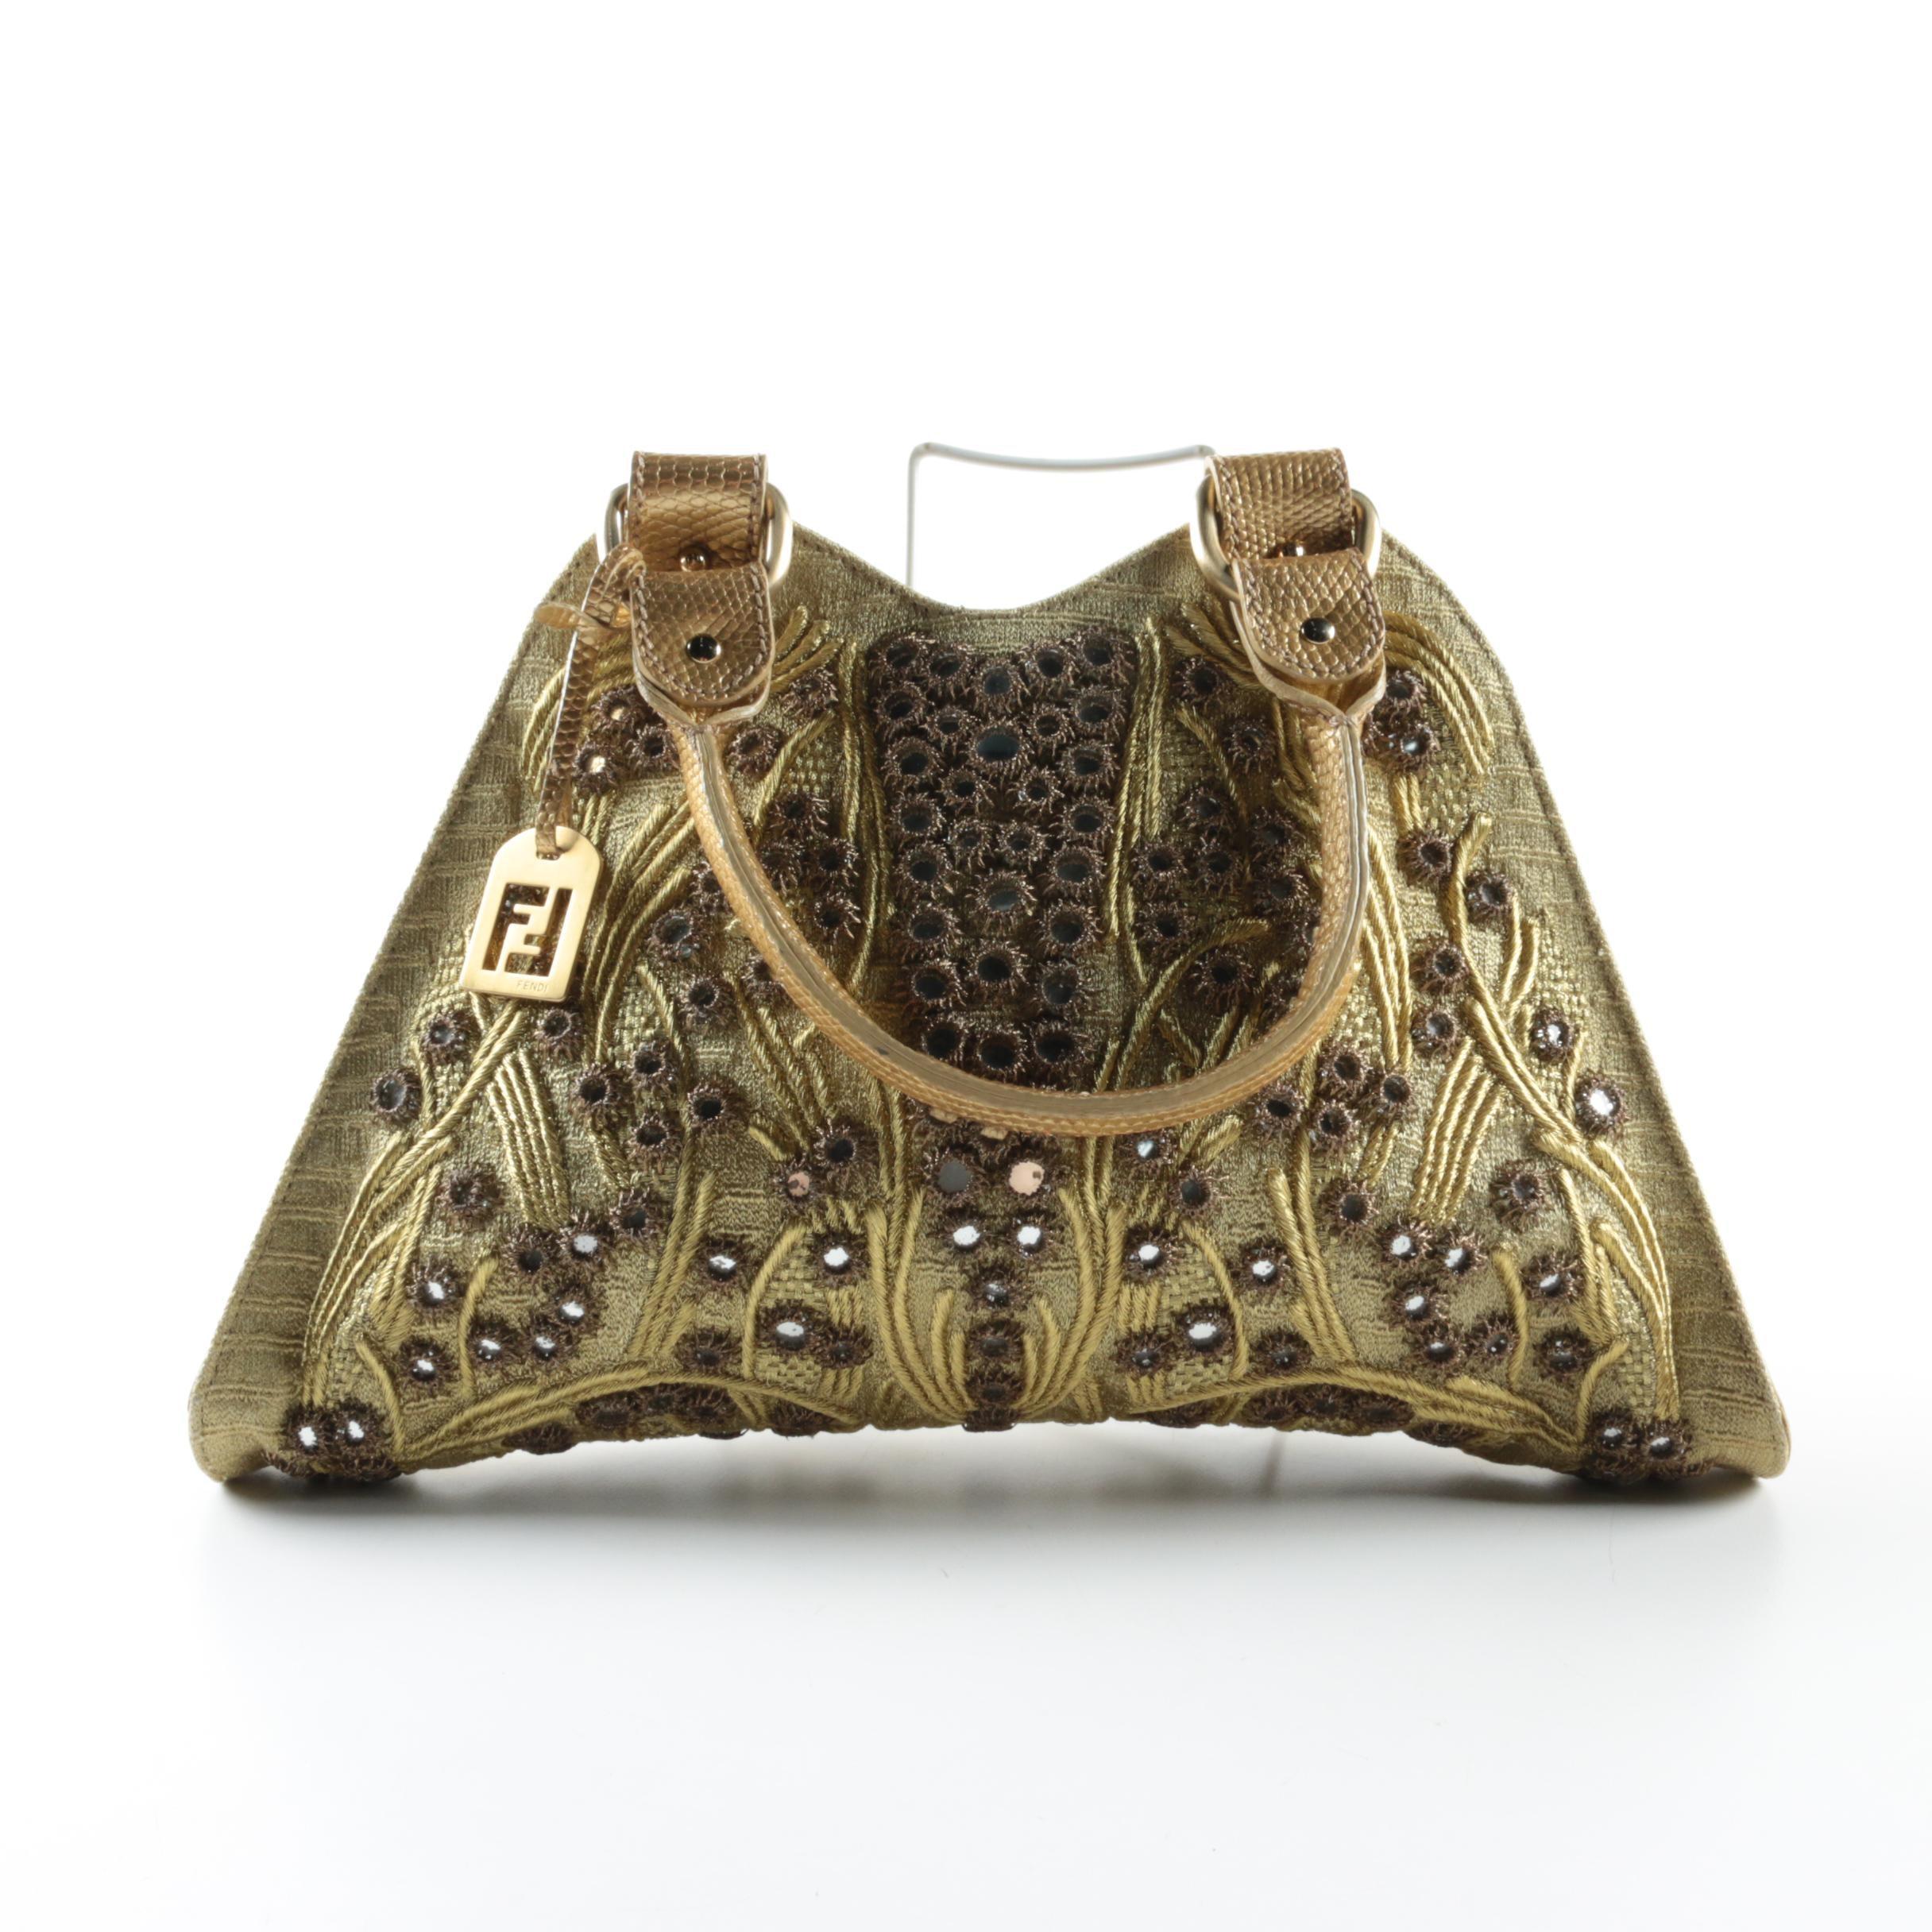 Fendi Shisha Embellished Lizard Skin Handbag